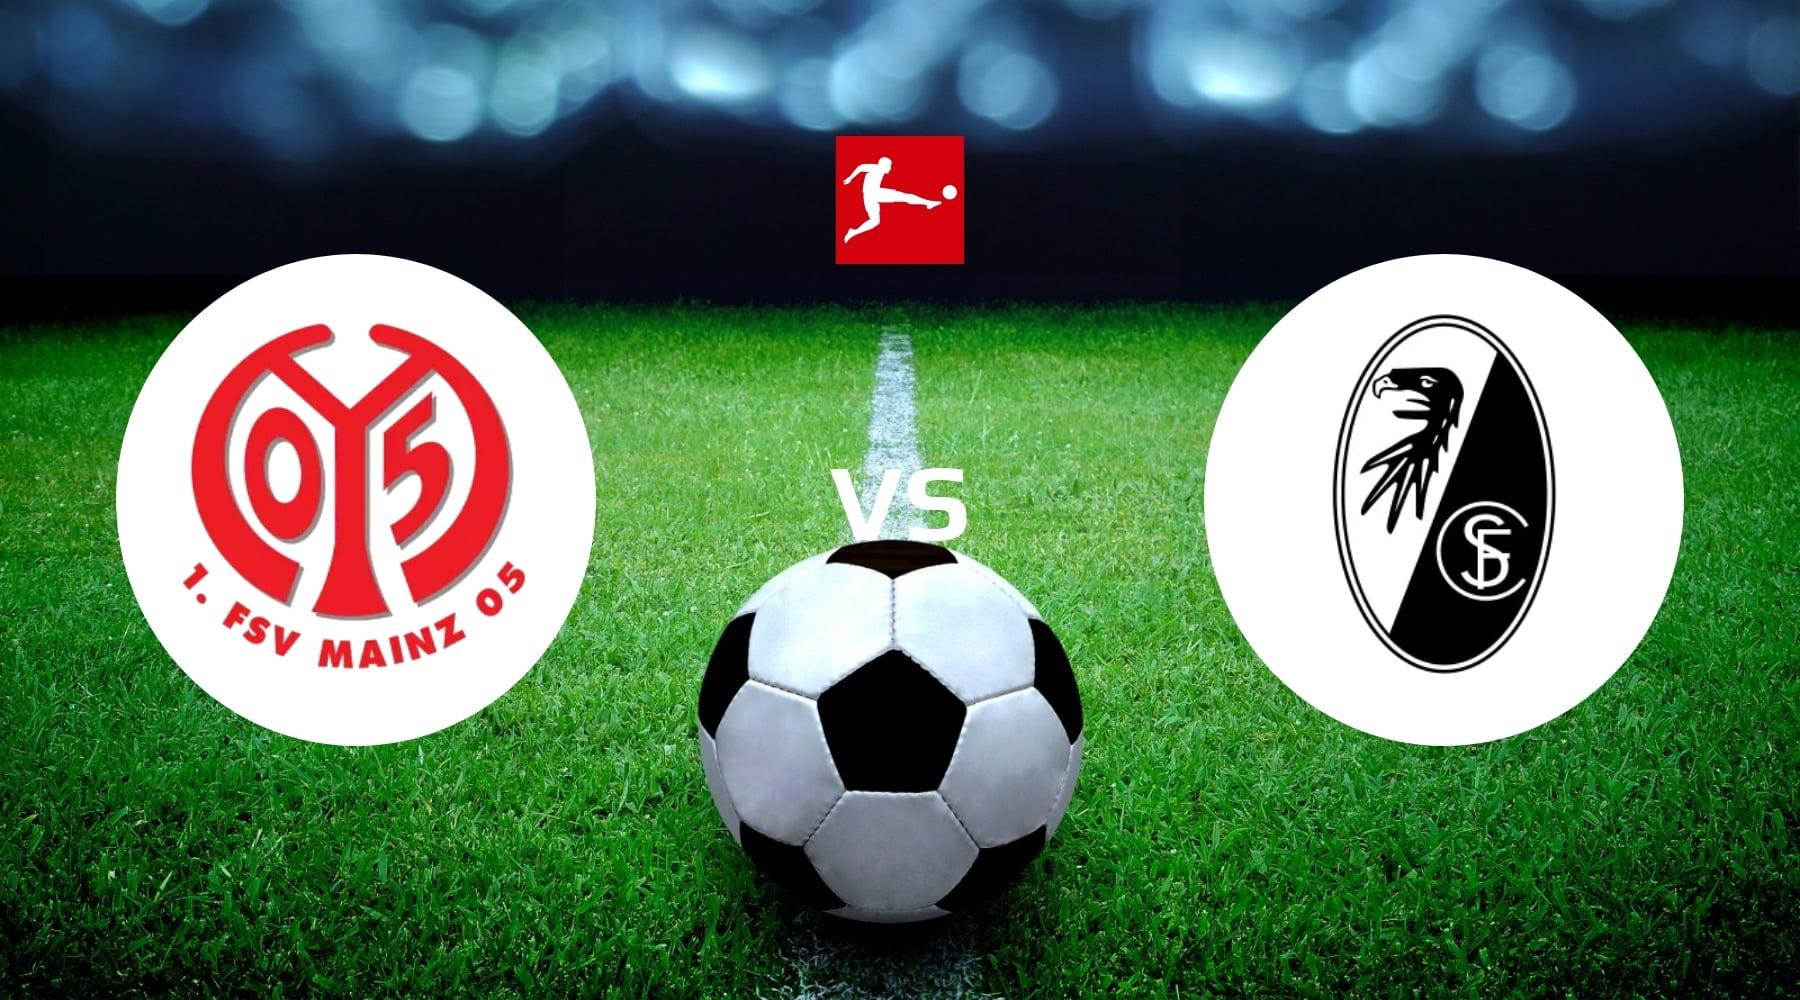 Mainz 05 vs SC Freiburg Betting